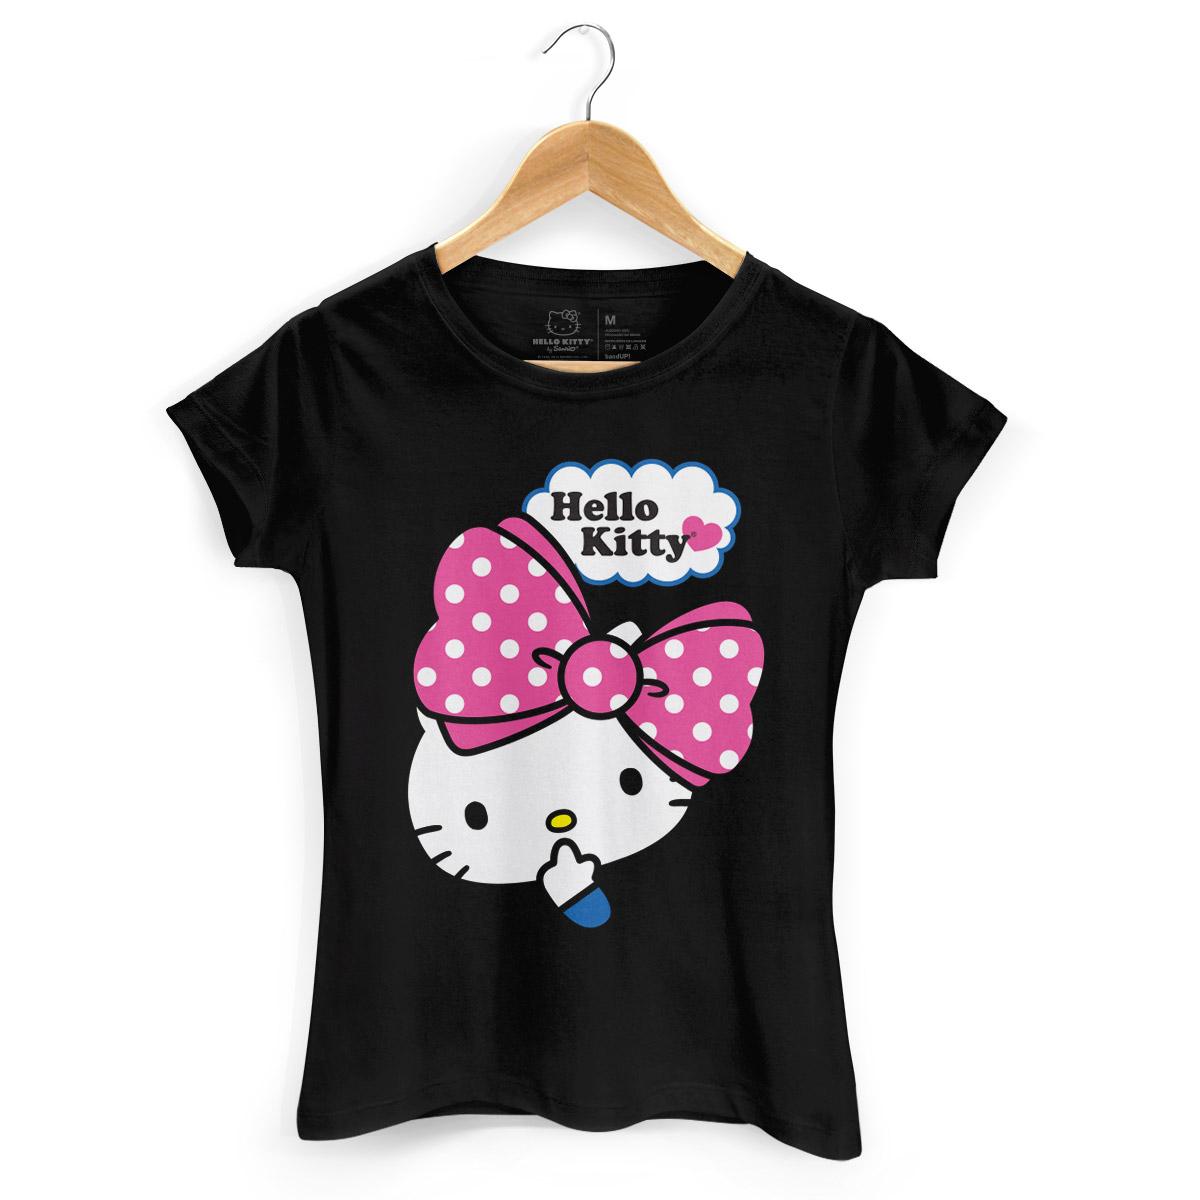 Camiseta Hello Kitty Big Ribbon